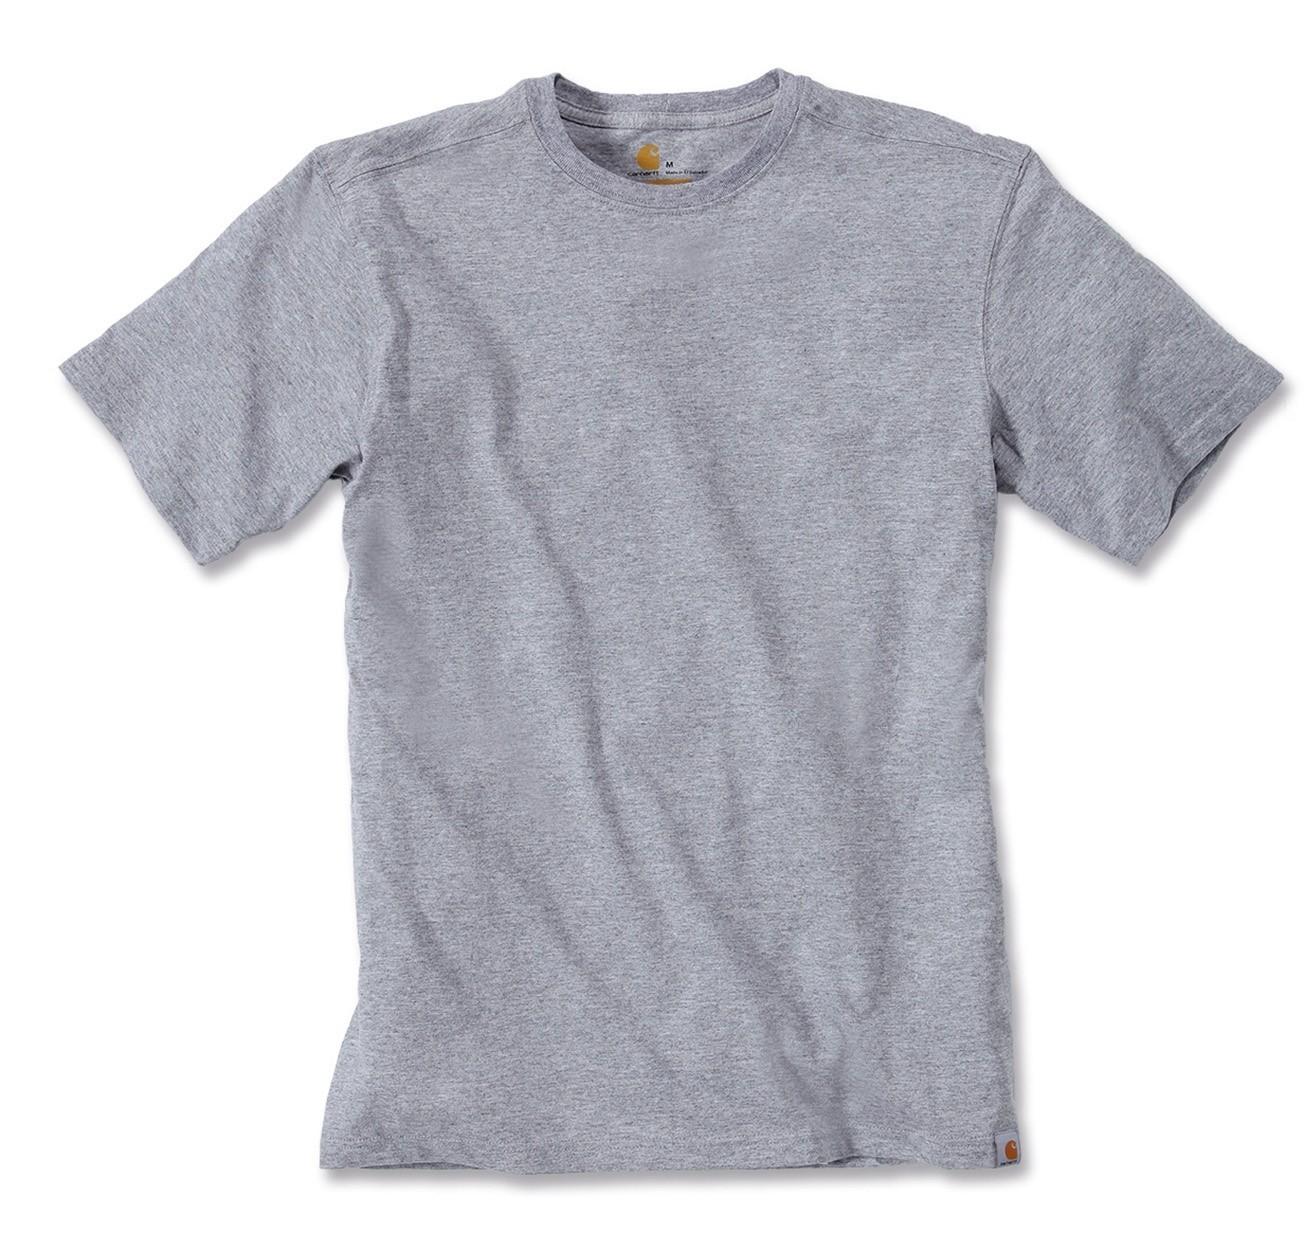 Carhartt Maddock T-Shirt : Heather Grey